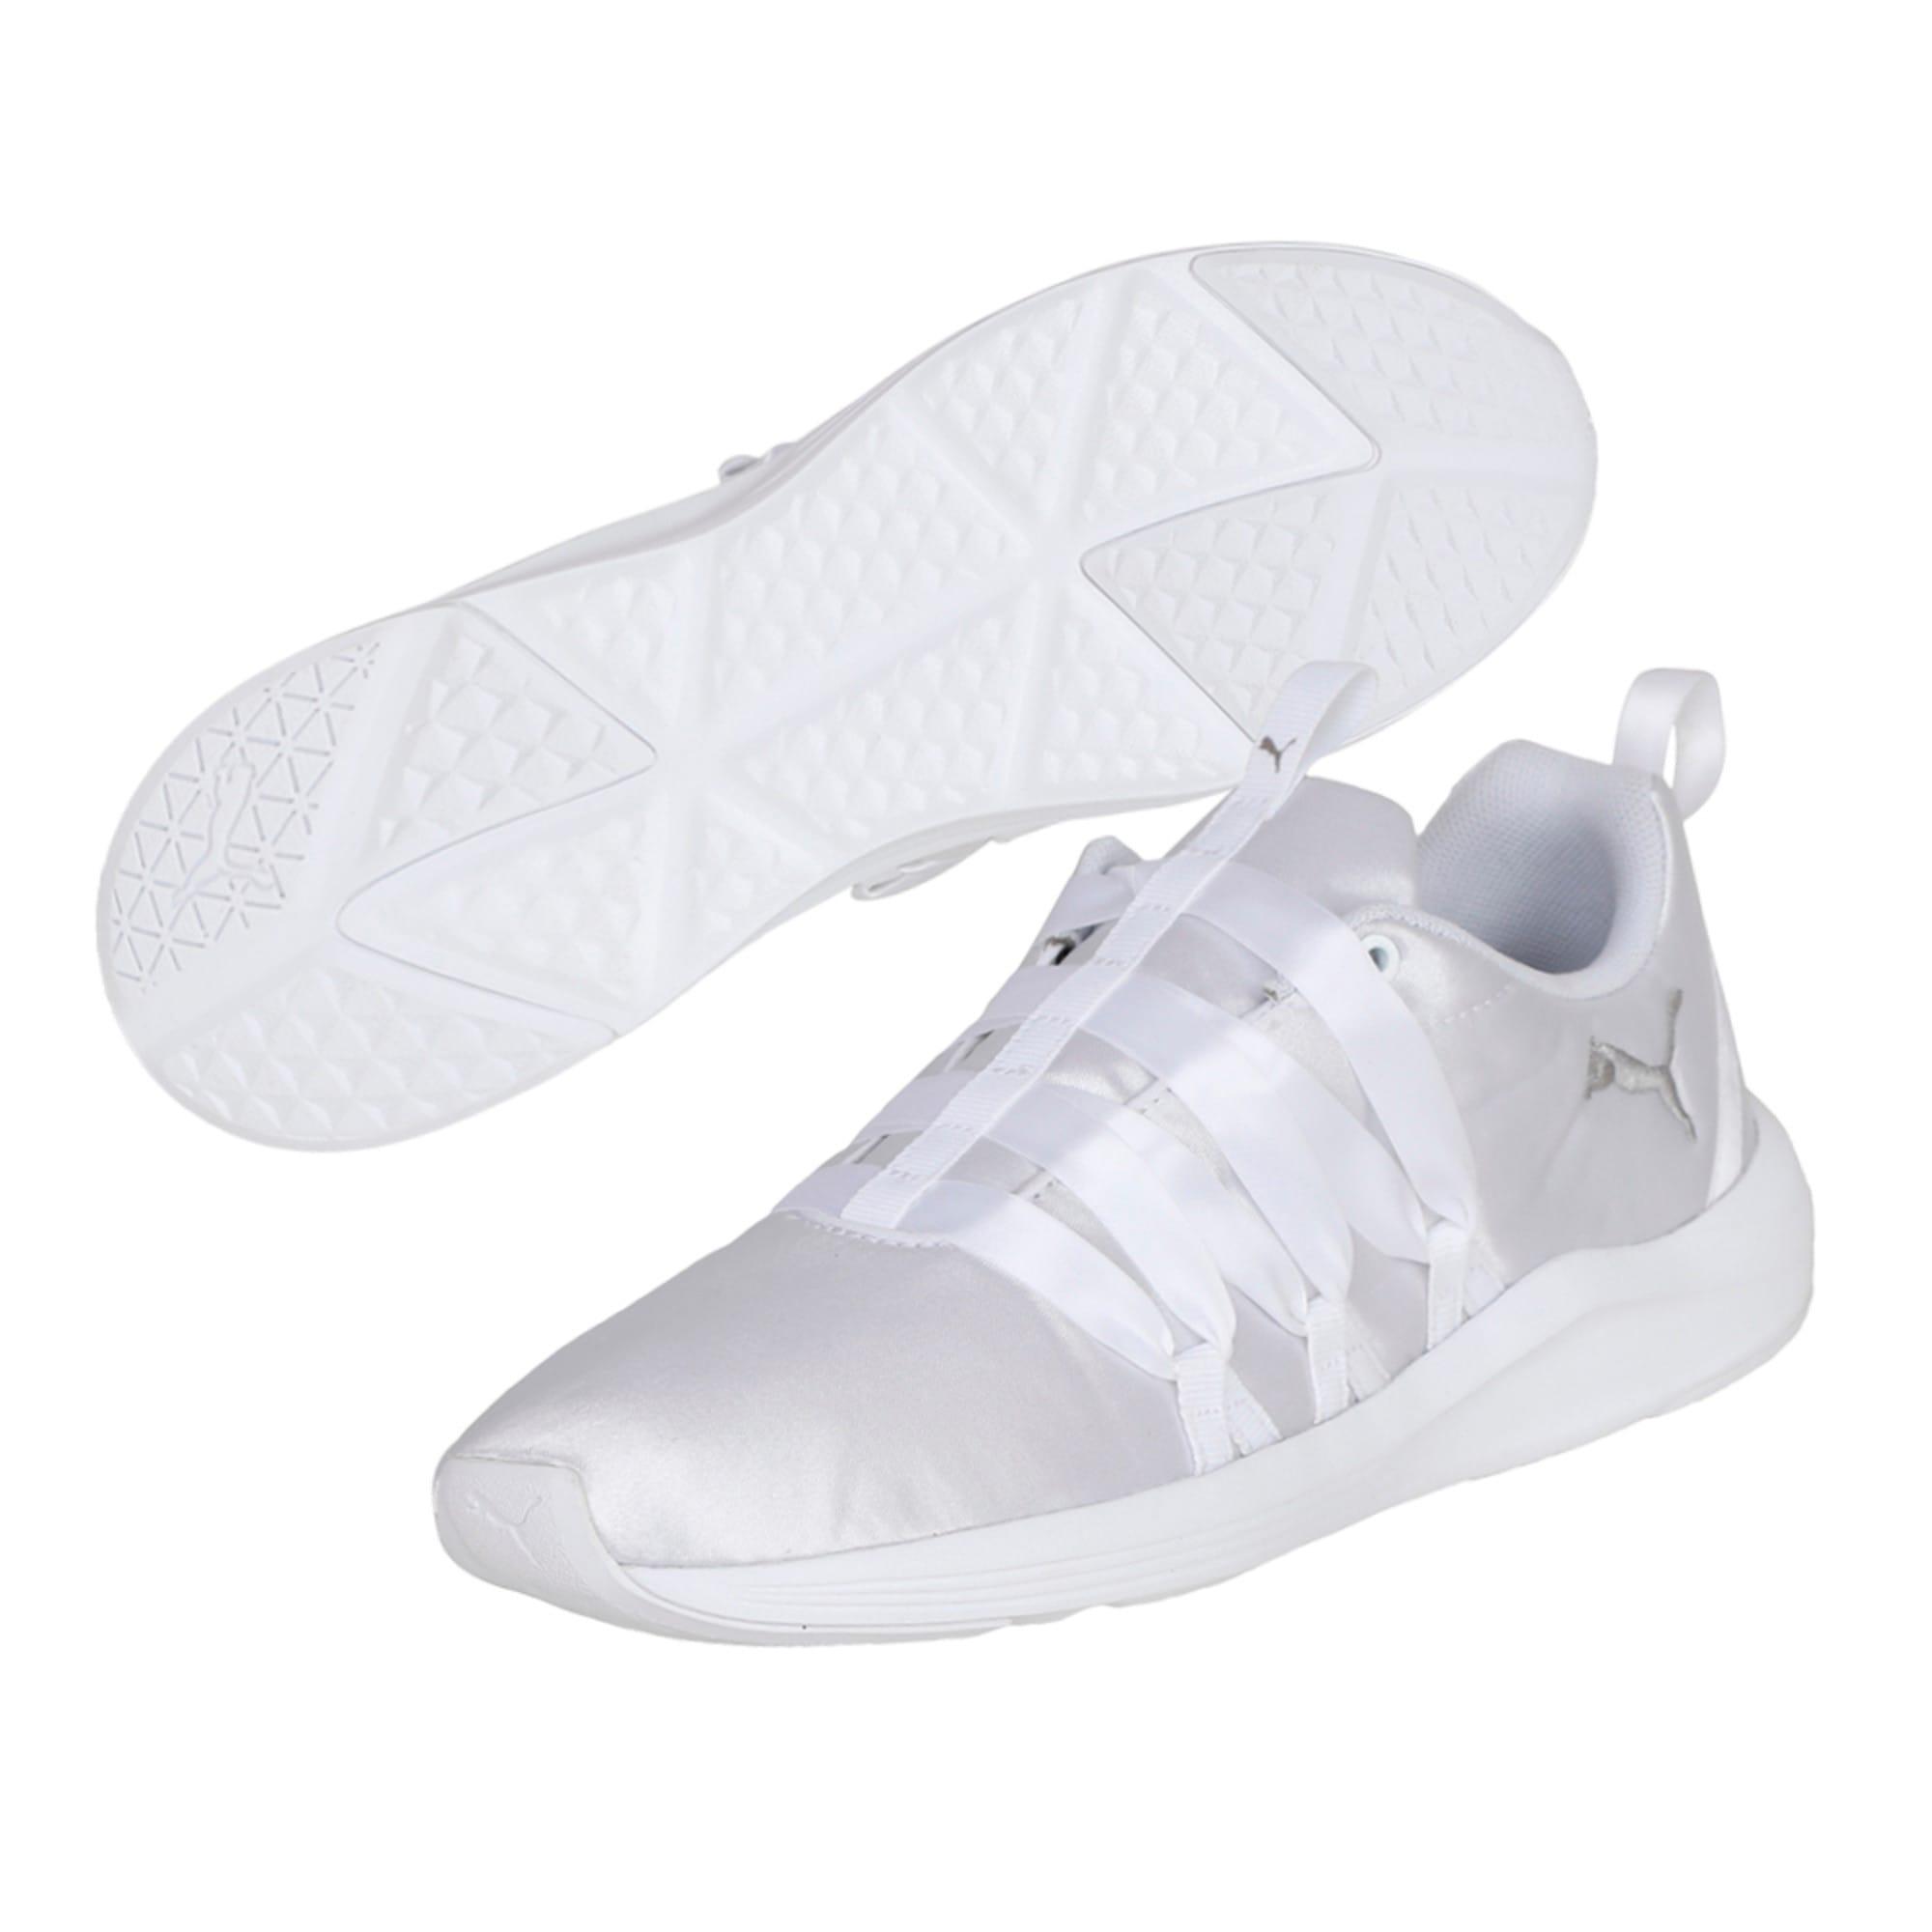 Thumbnail 2 of Prowl Alt Satin Women's Training Shoes, Puma White, medium-IND